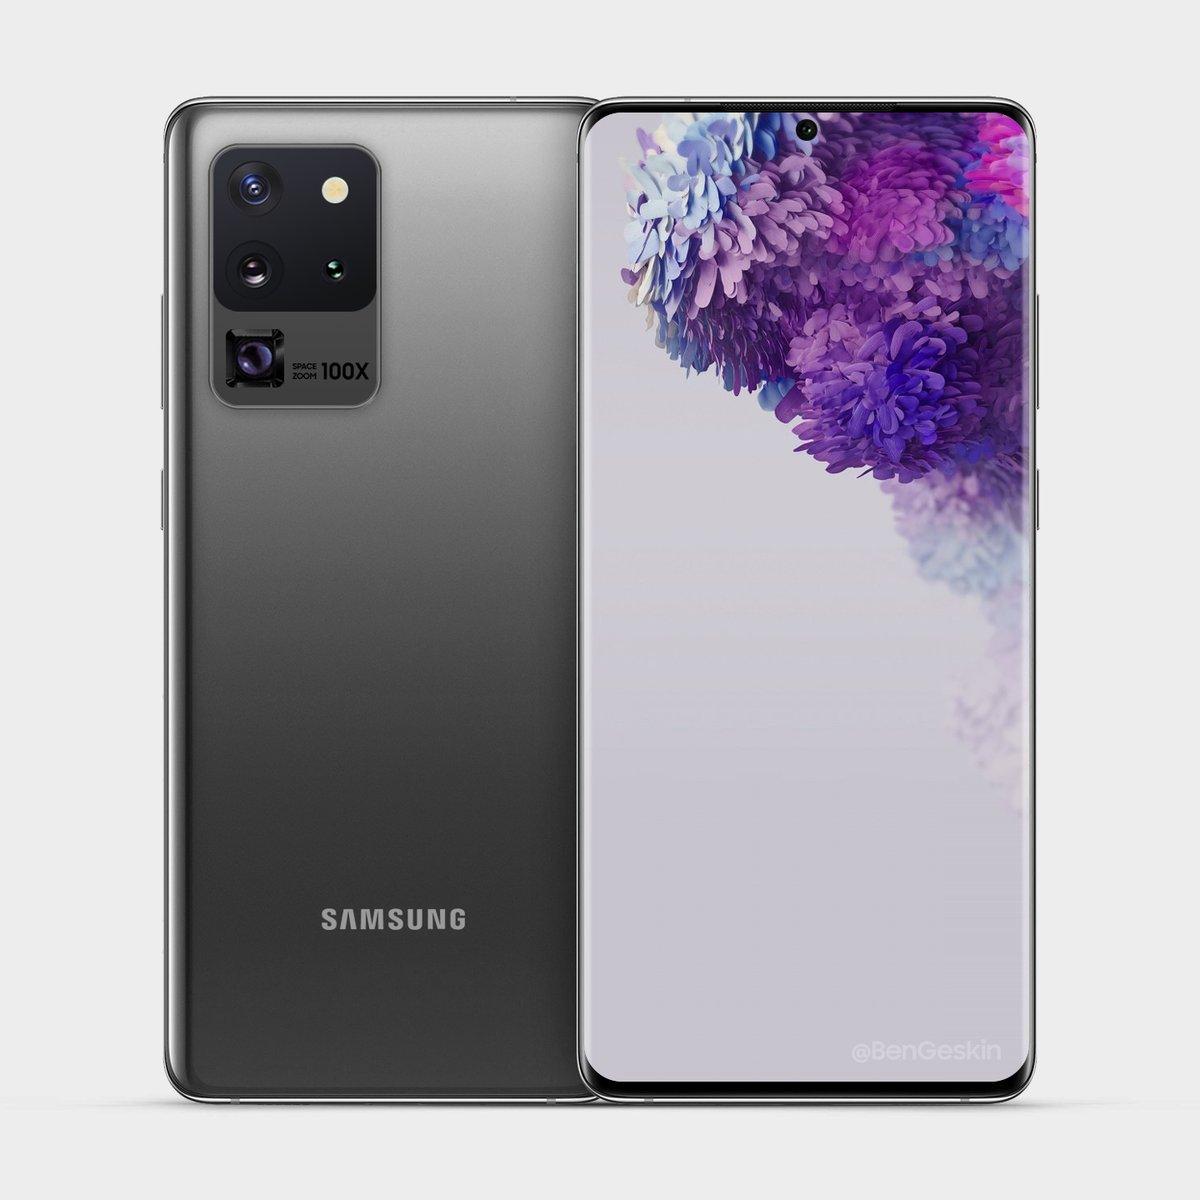 5G-s Samsung-Galaxy-S20-Ultra